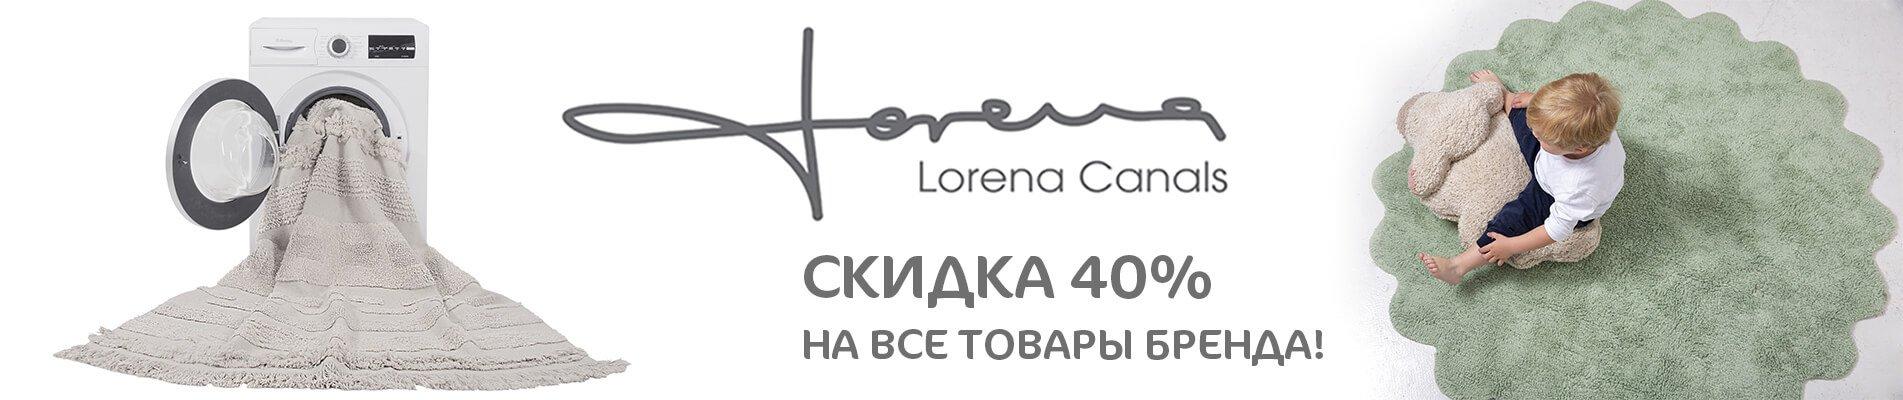 lc200220-1